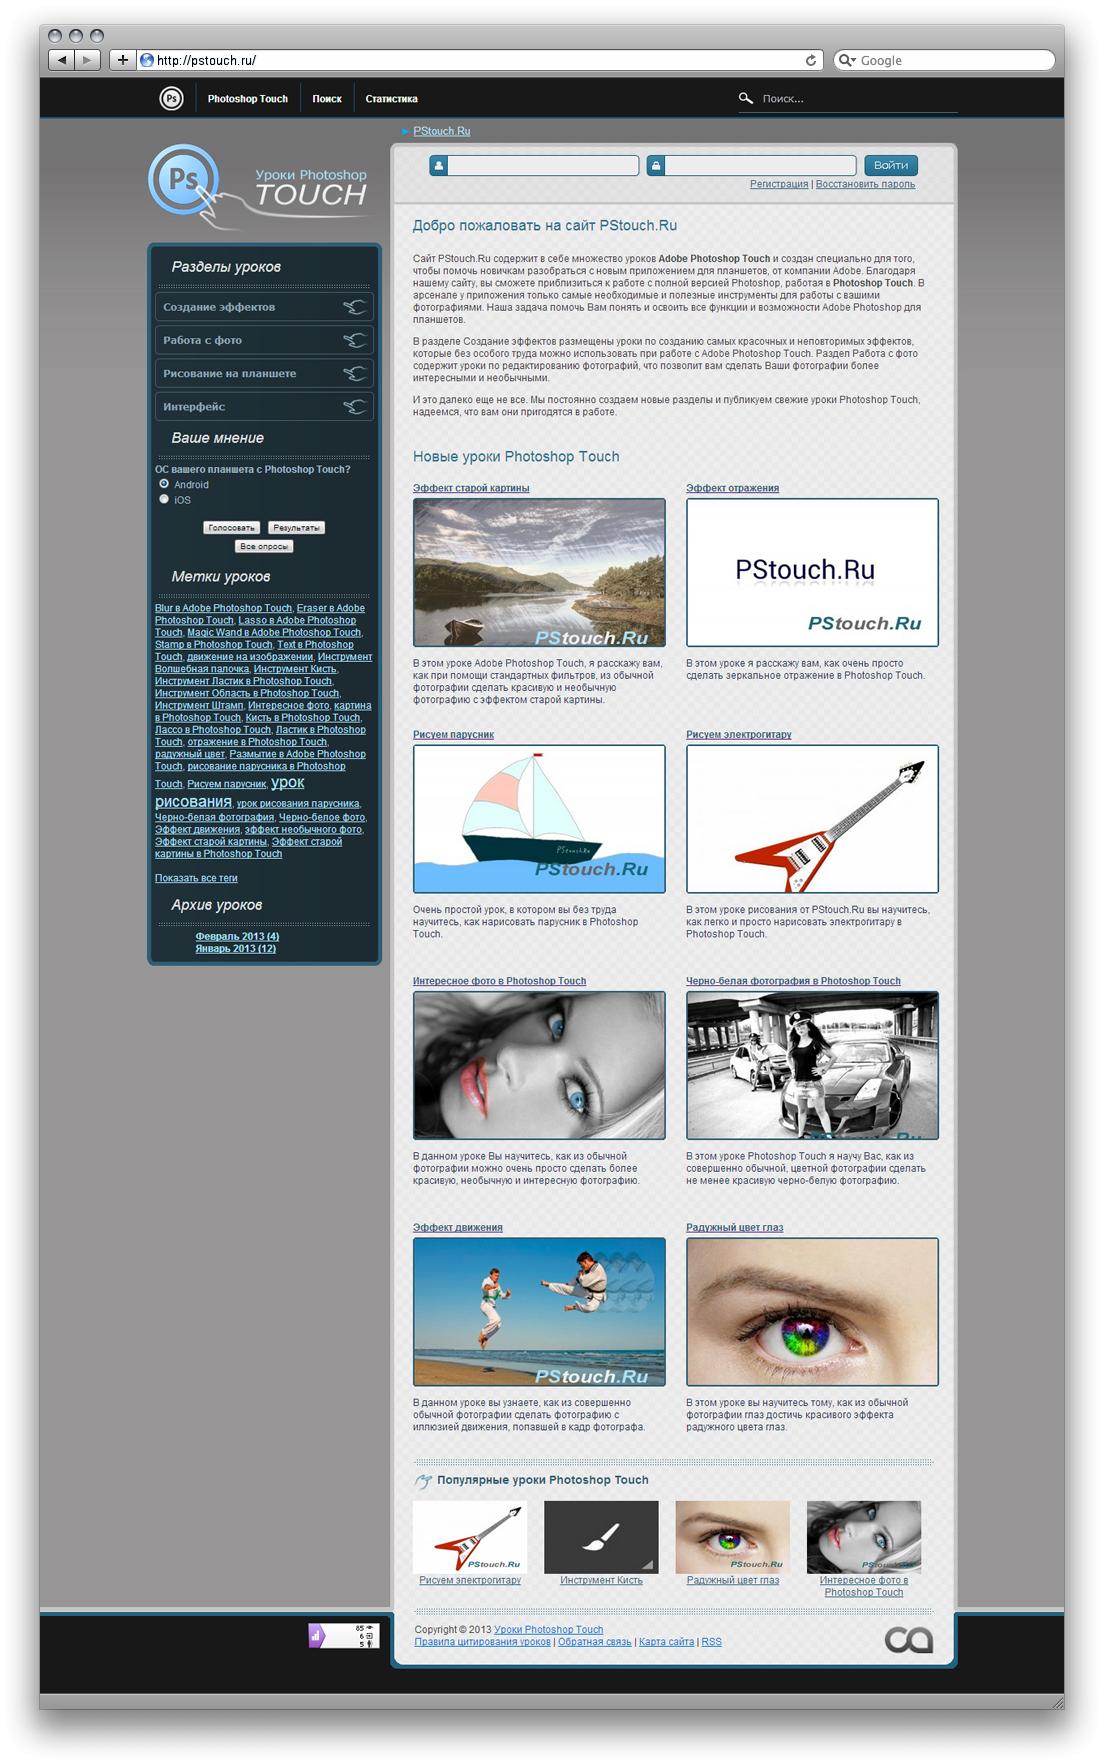 Дизайн для сайта о Adobe Photoshop Touch - PStouch